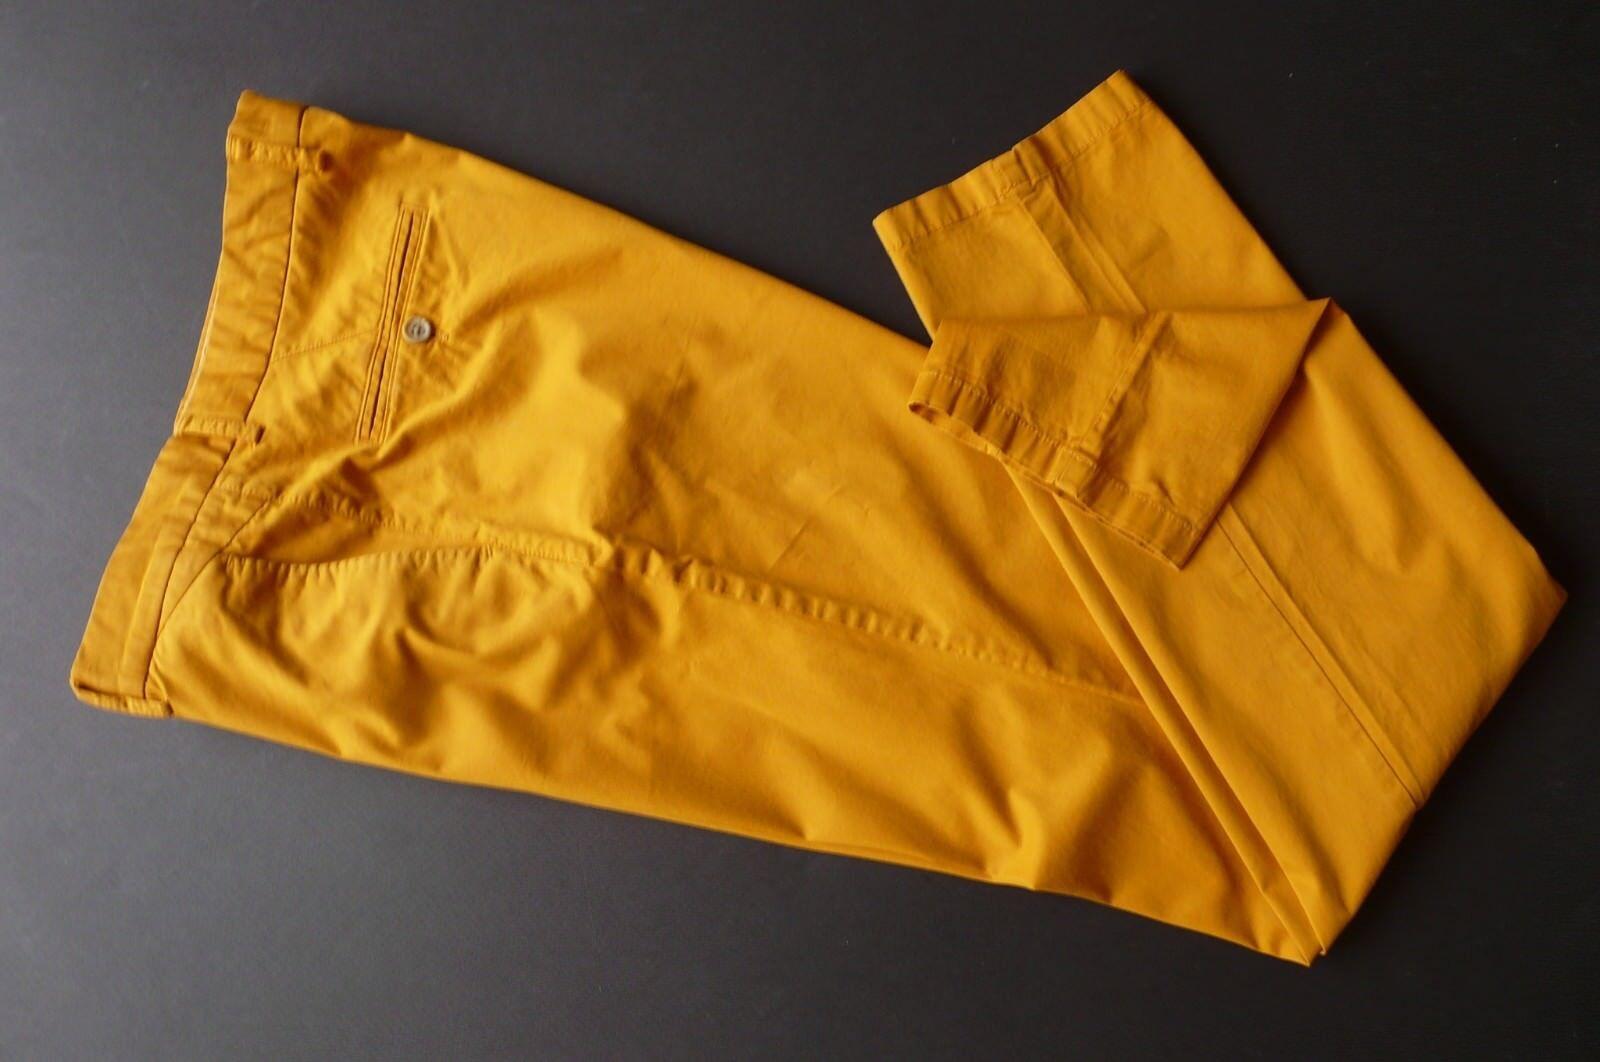 MAS O  MILANO 97% COTTON SLIM FIT BRIGHT orange COLOR PANTS sz 36 ( EUR-sz 46)  high quality genuine